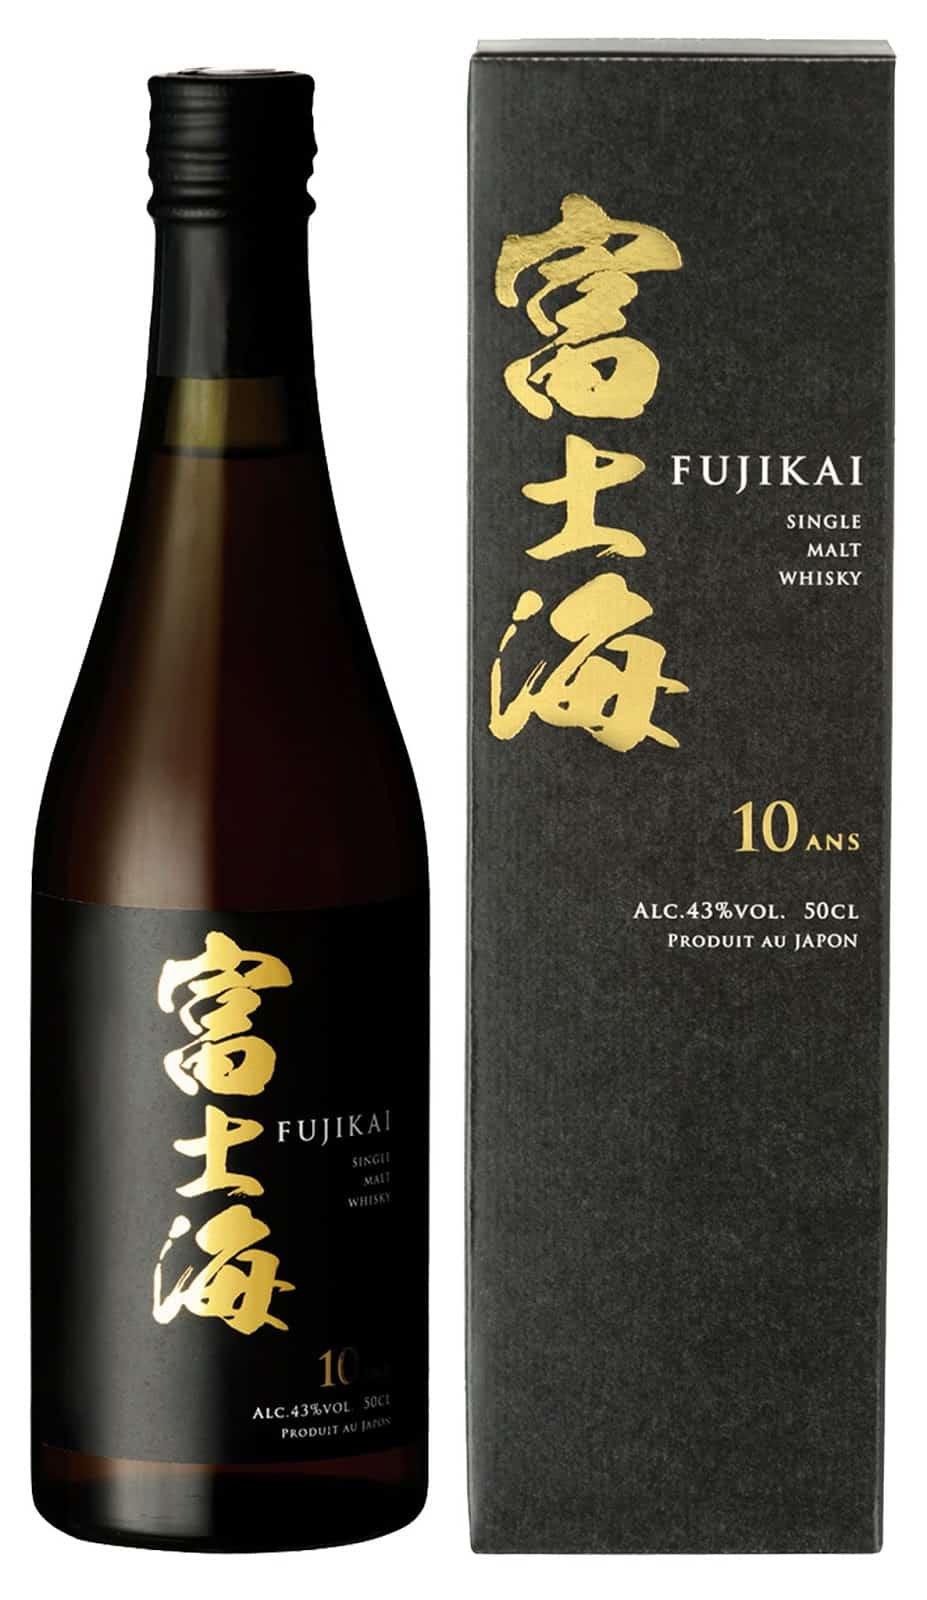 Fujikai Single Malt 10 Years Old